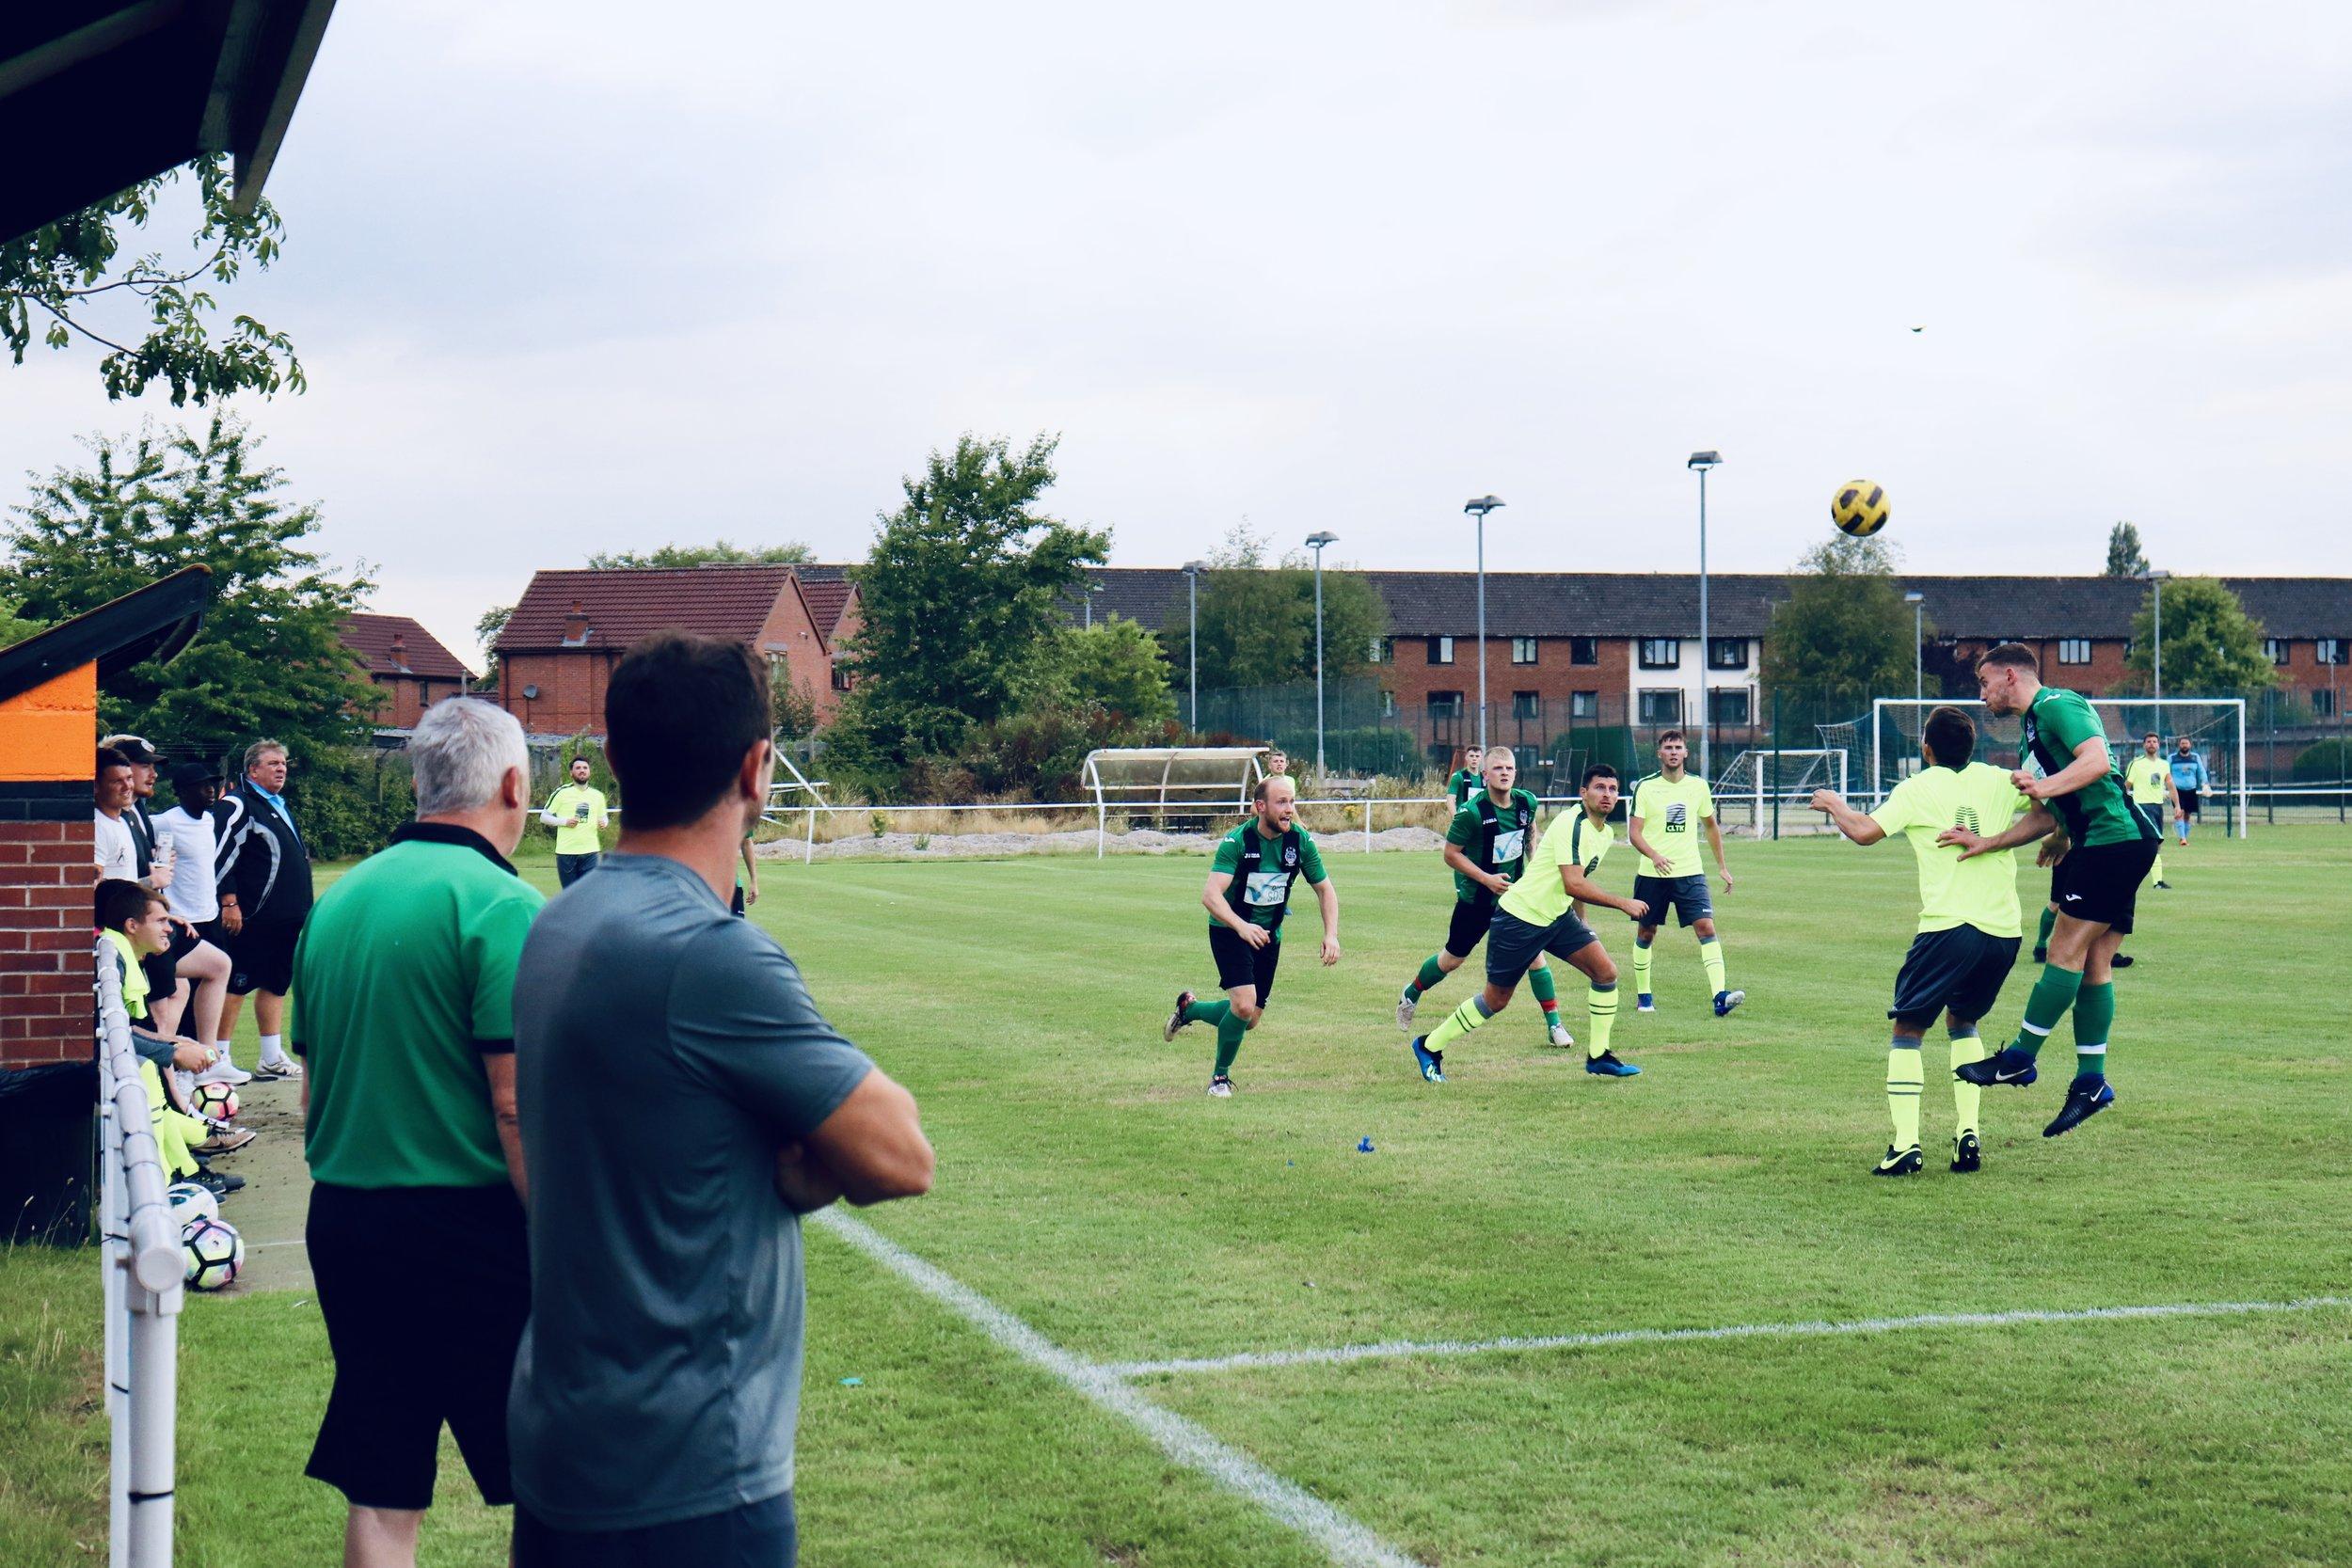 The coaching staff providing watching eyes